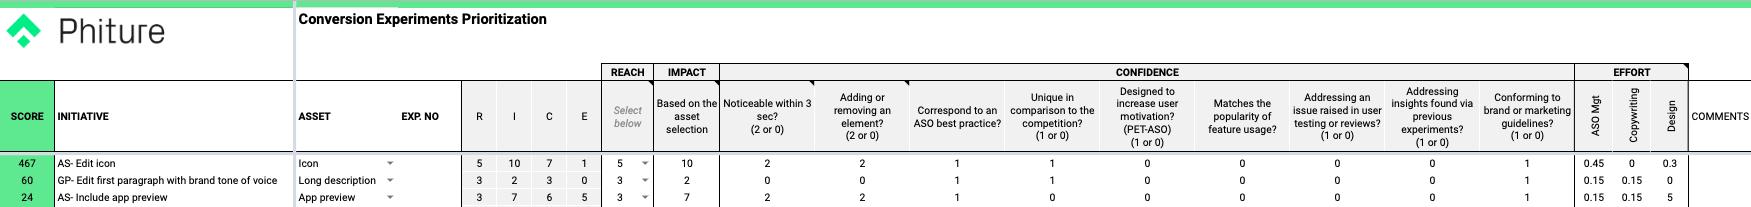 conversion experiments prioritization